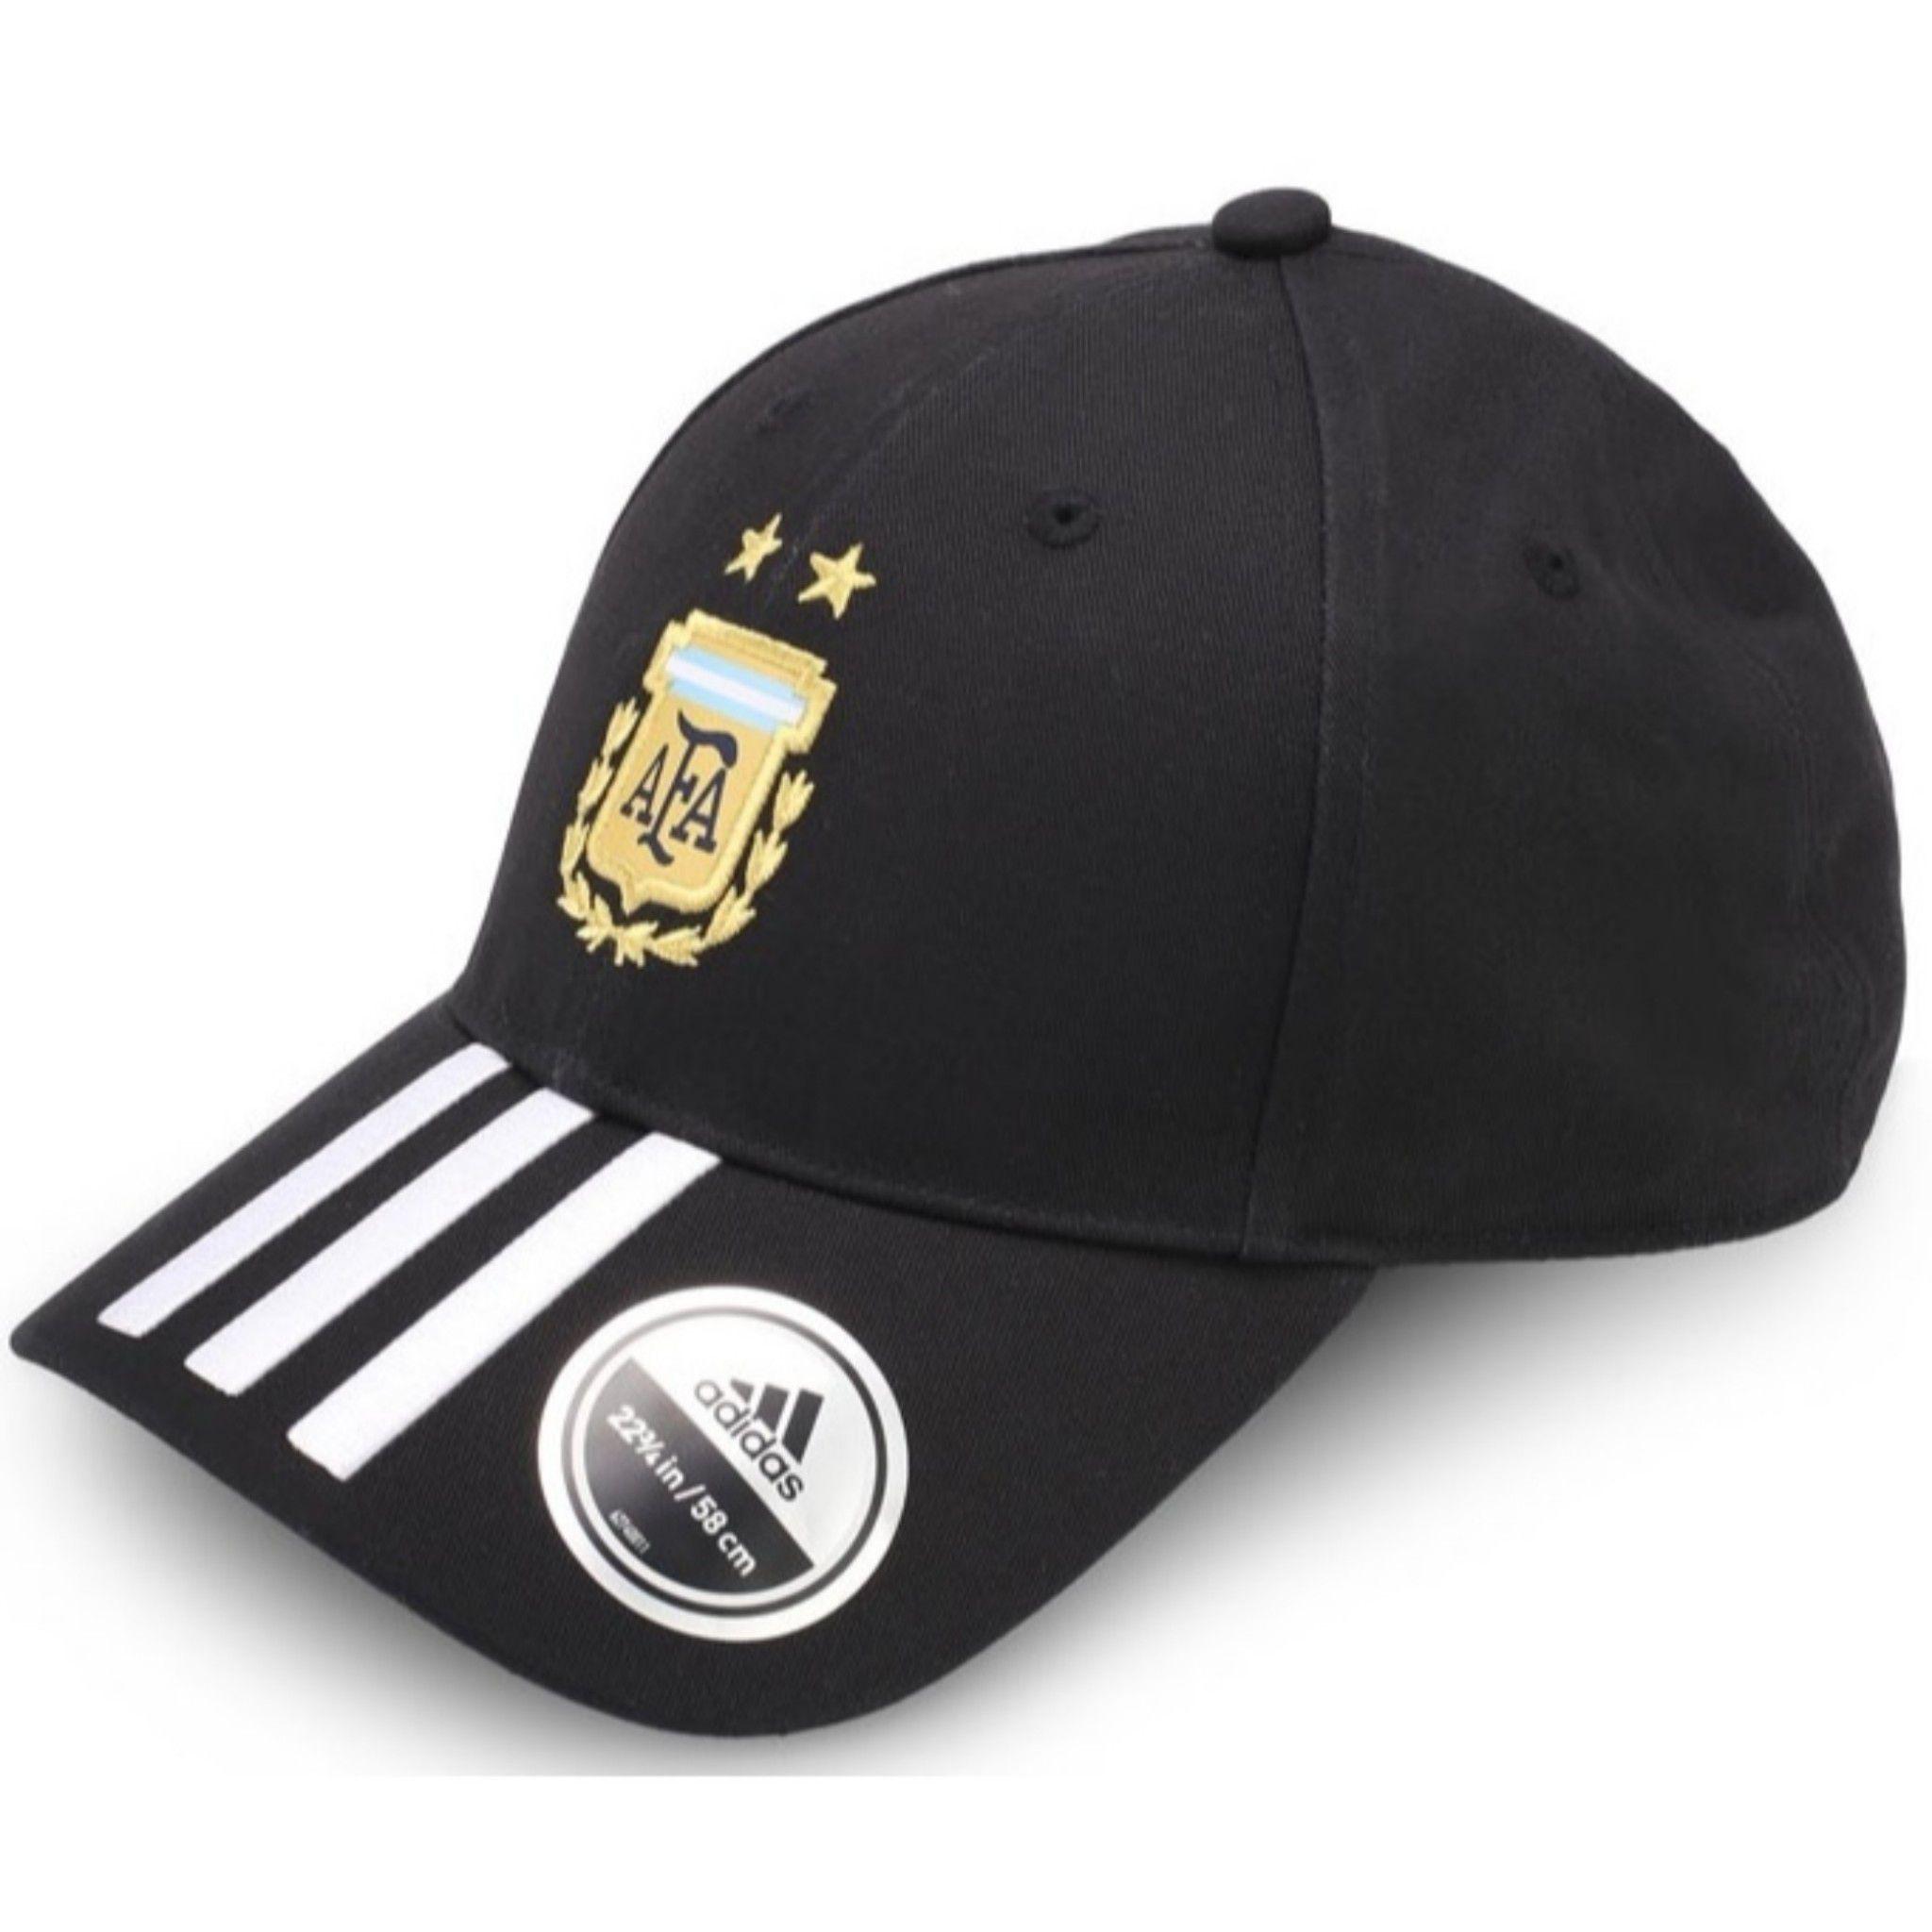 Adidas Black Printed Cotton Caps